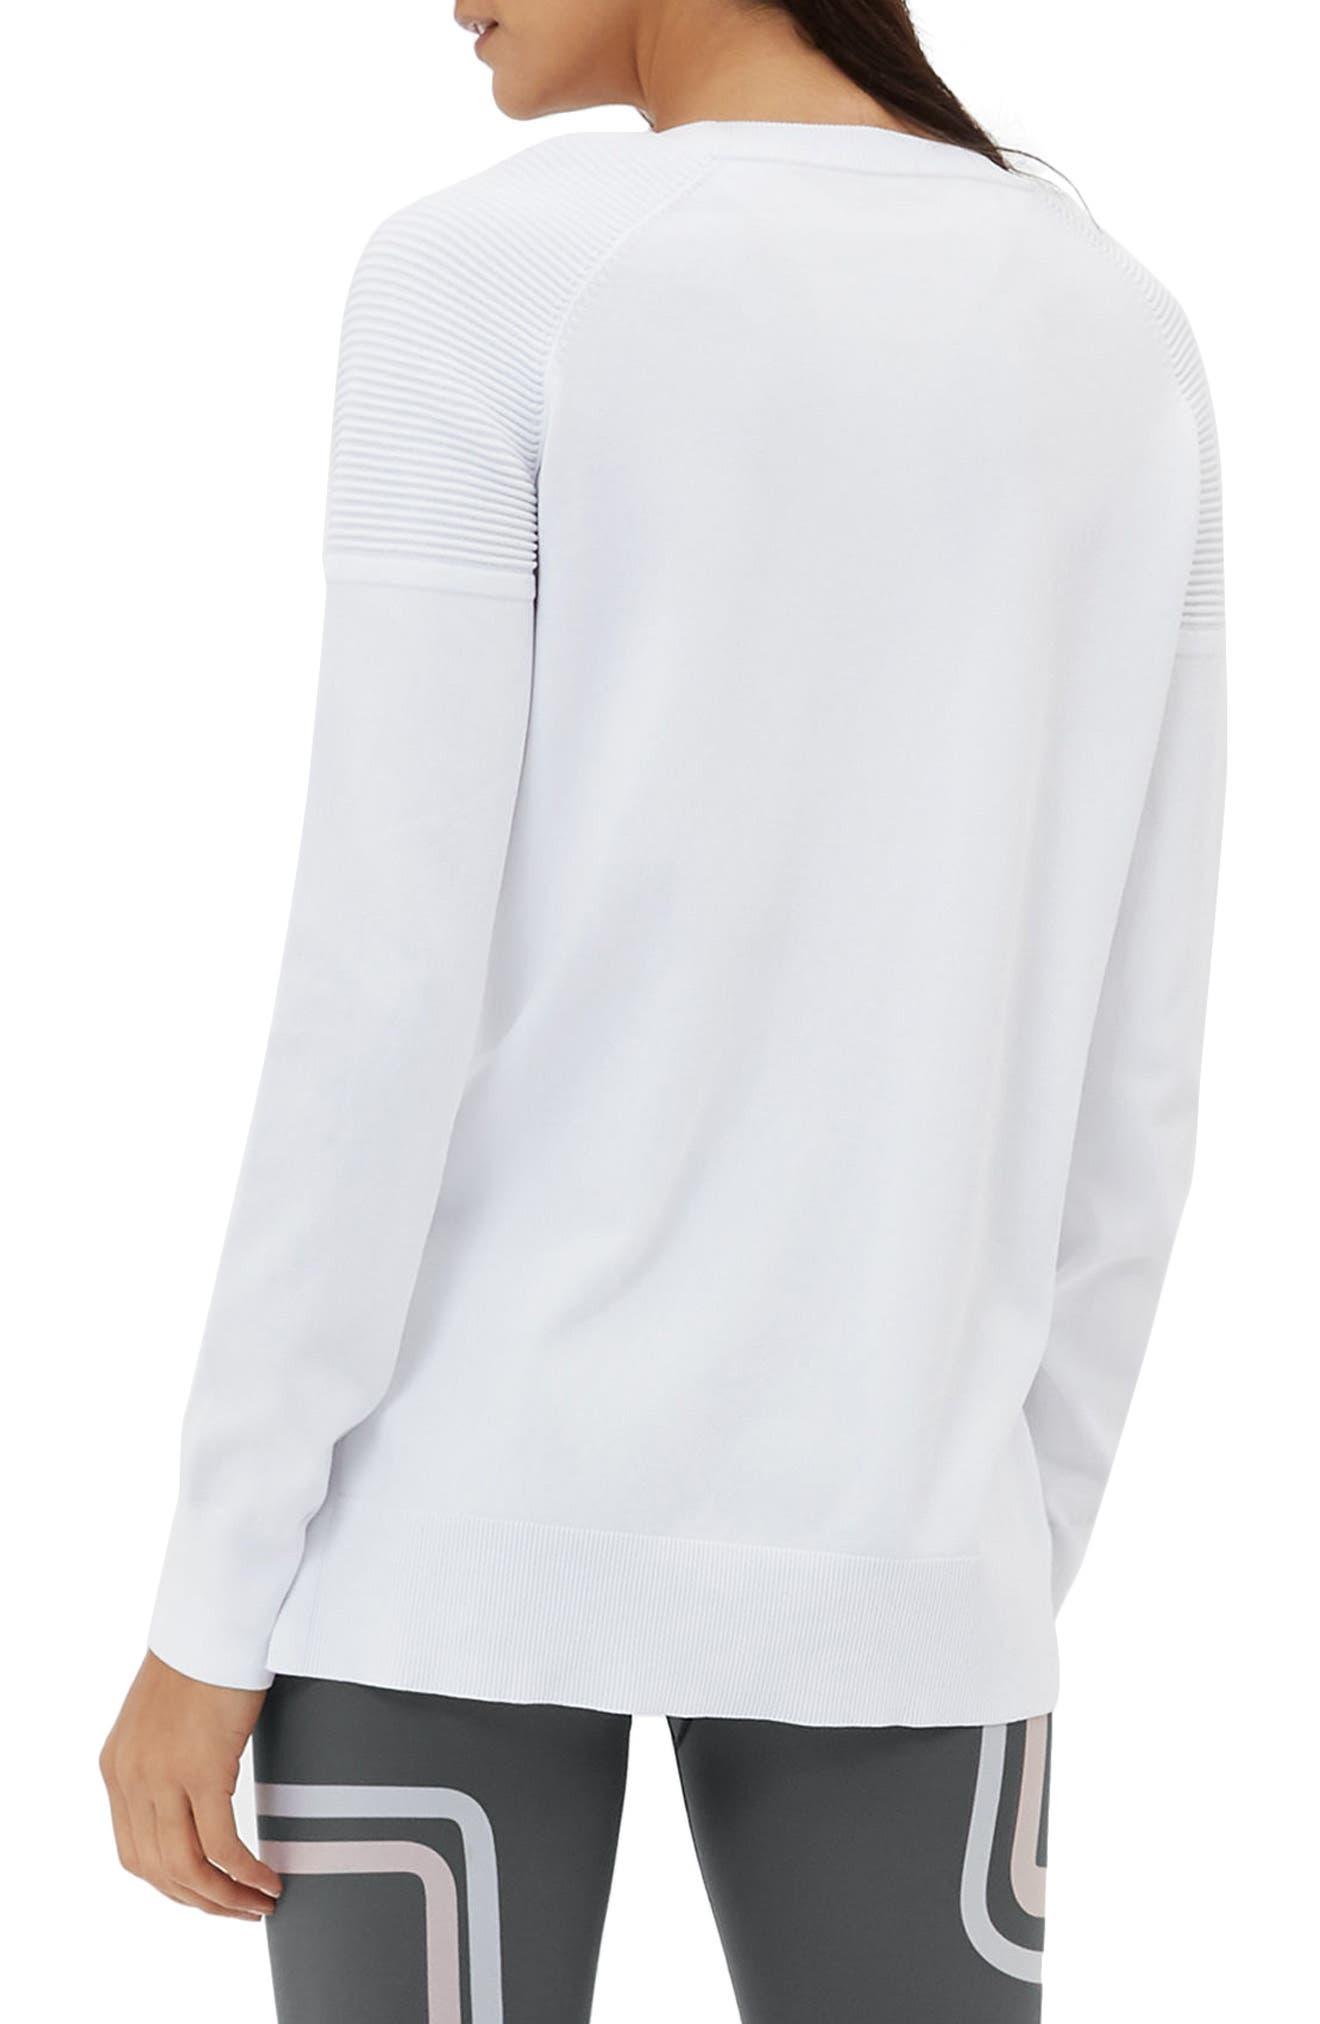 8 Track Sweatshirt,                             Alternate thumbnail 2, color,                             100